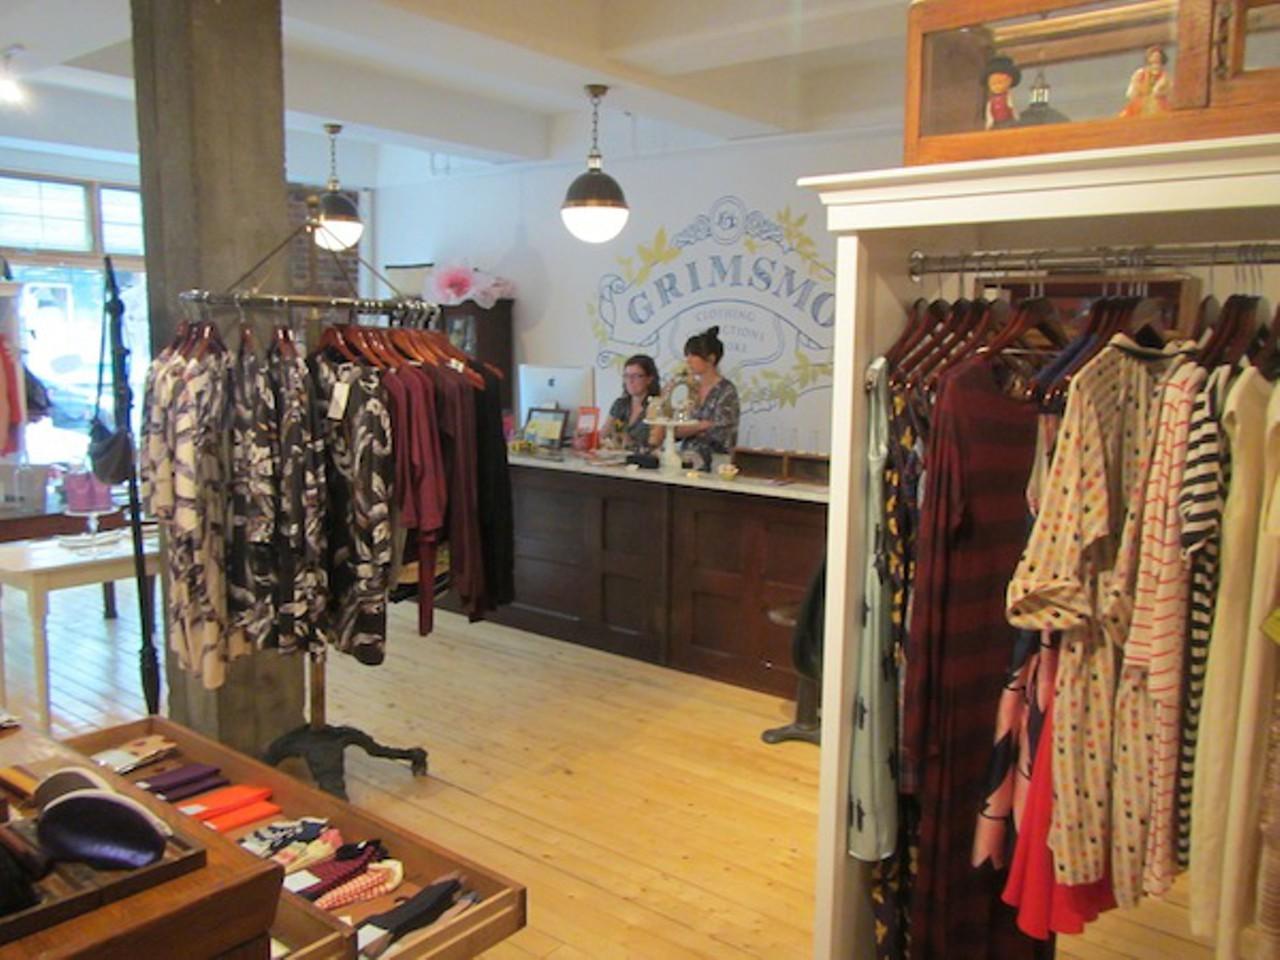 Women's boutique, J&R Grimsmo